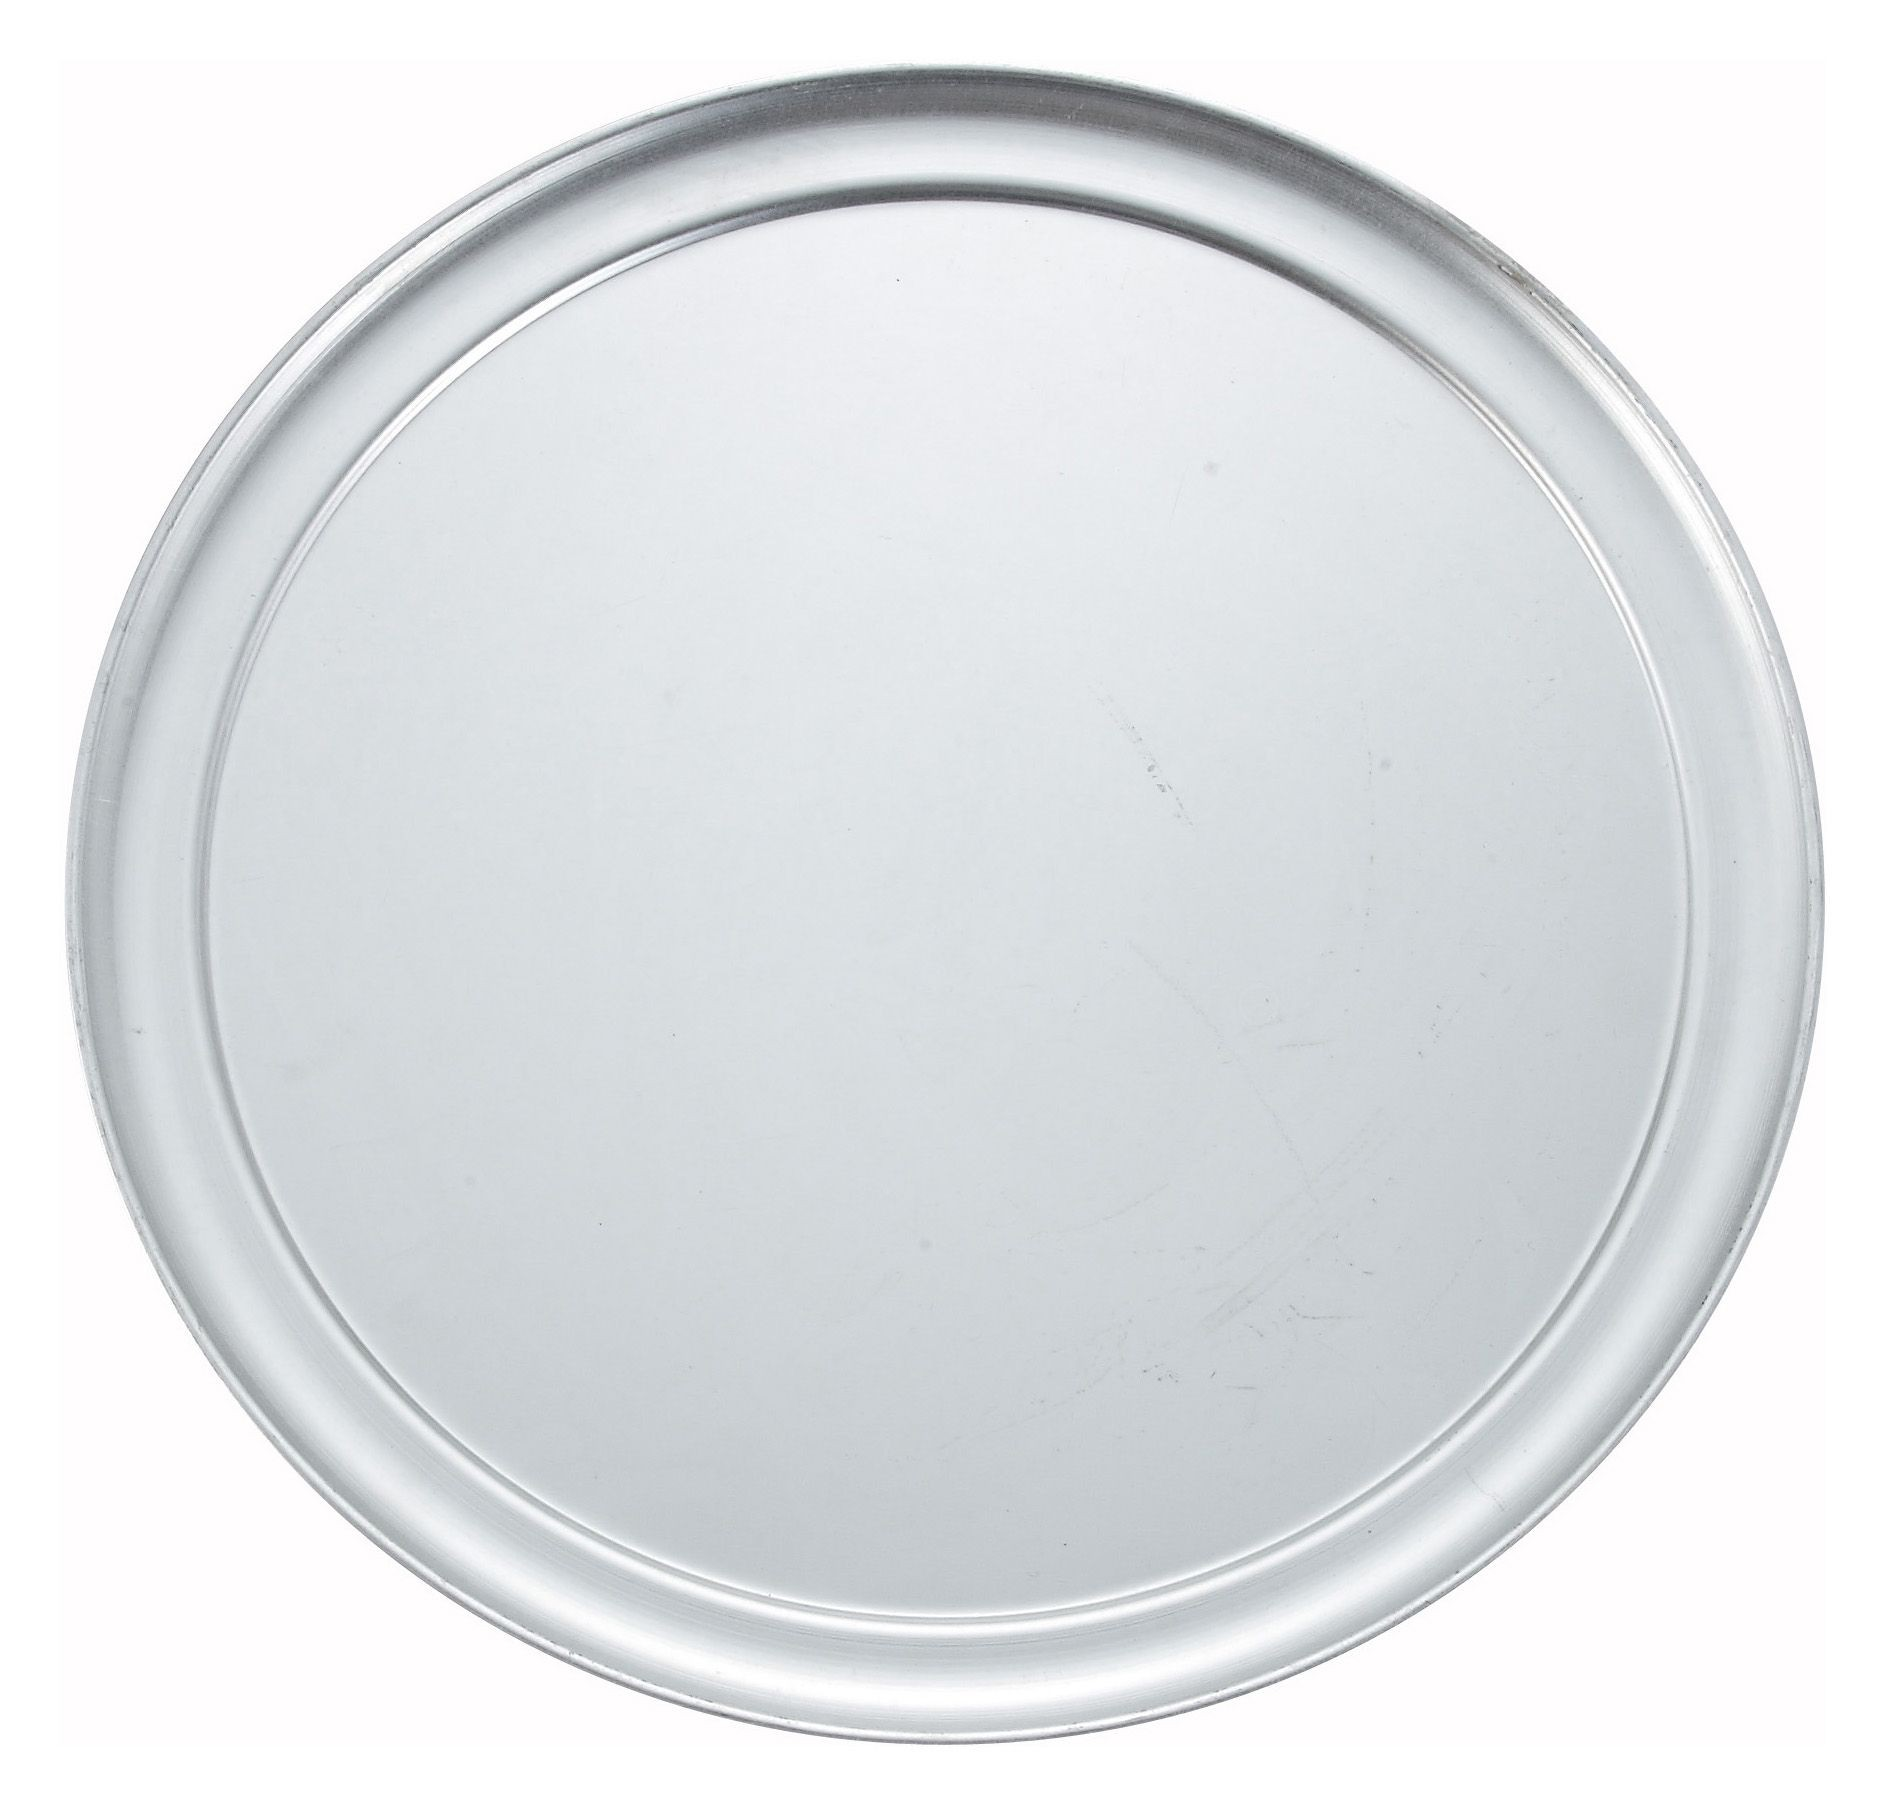 "Winco APZT-14 Wide-Rimmed Aluminum Pizza Pan 14"" Dia."